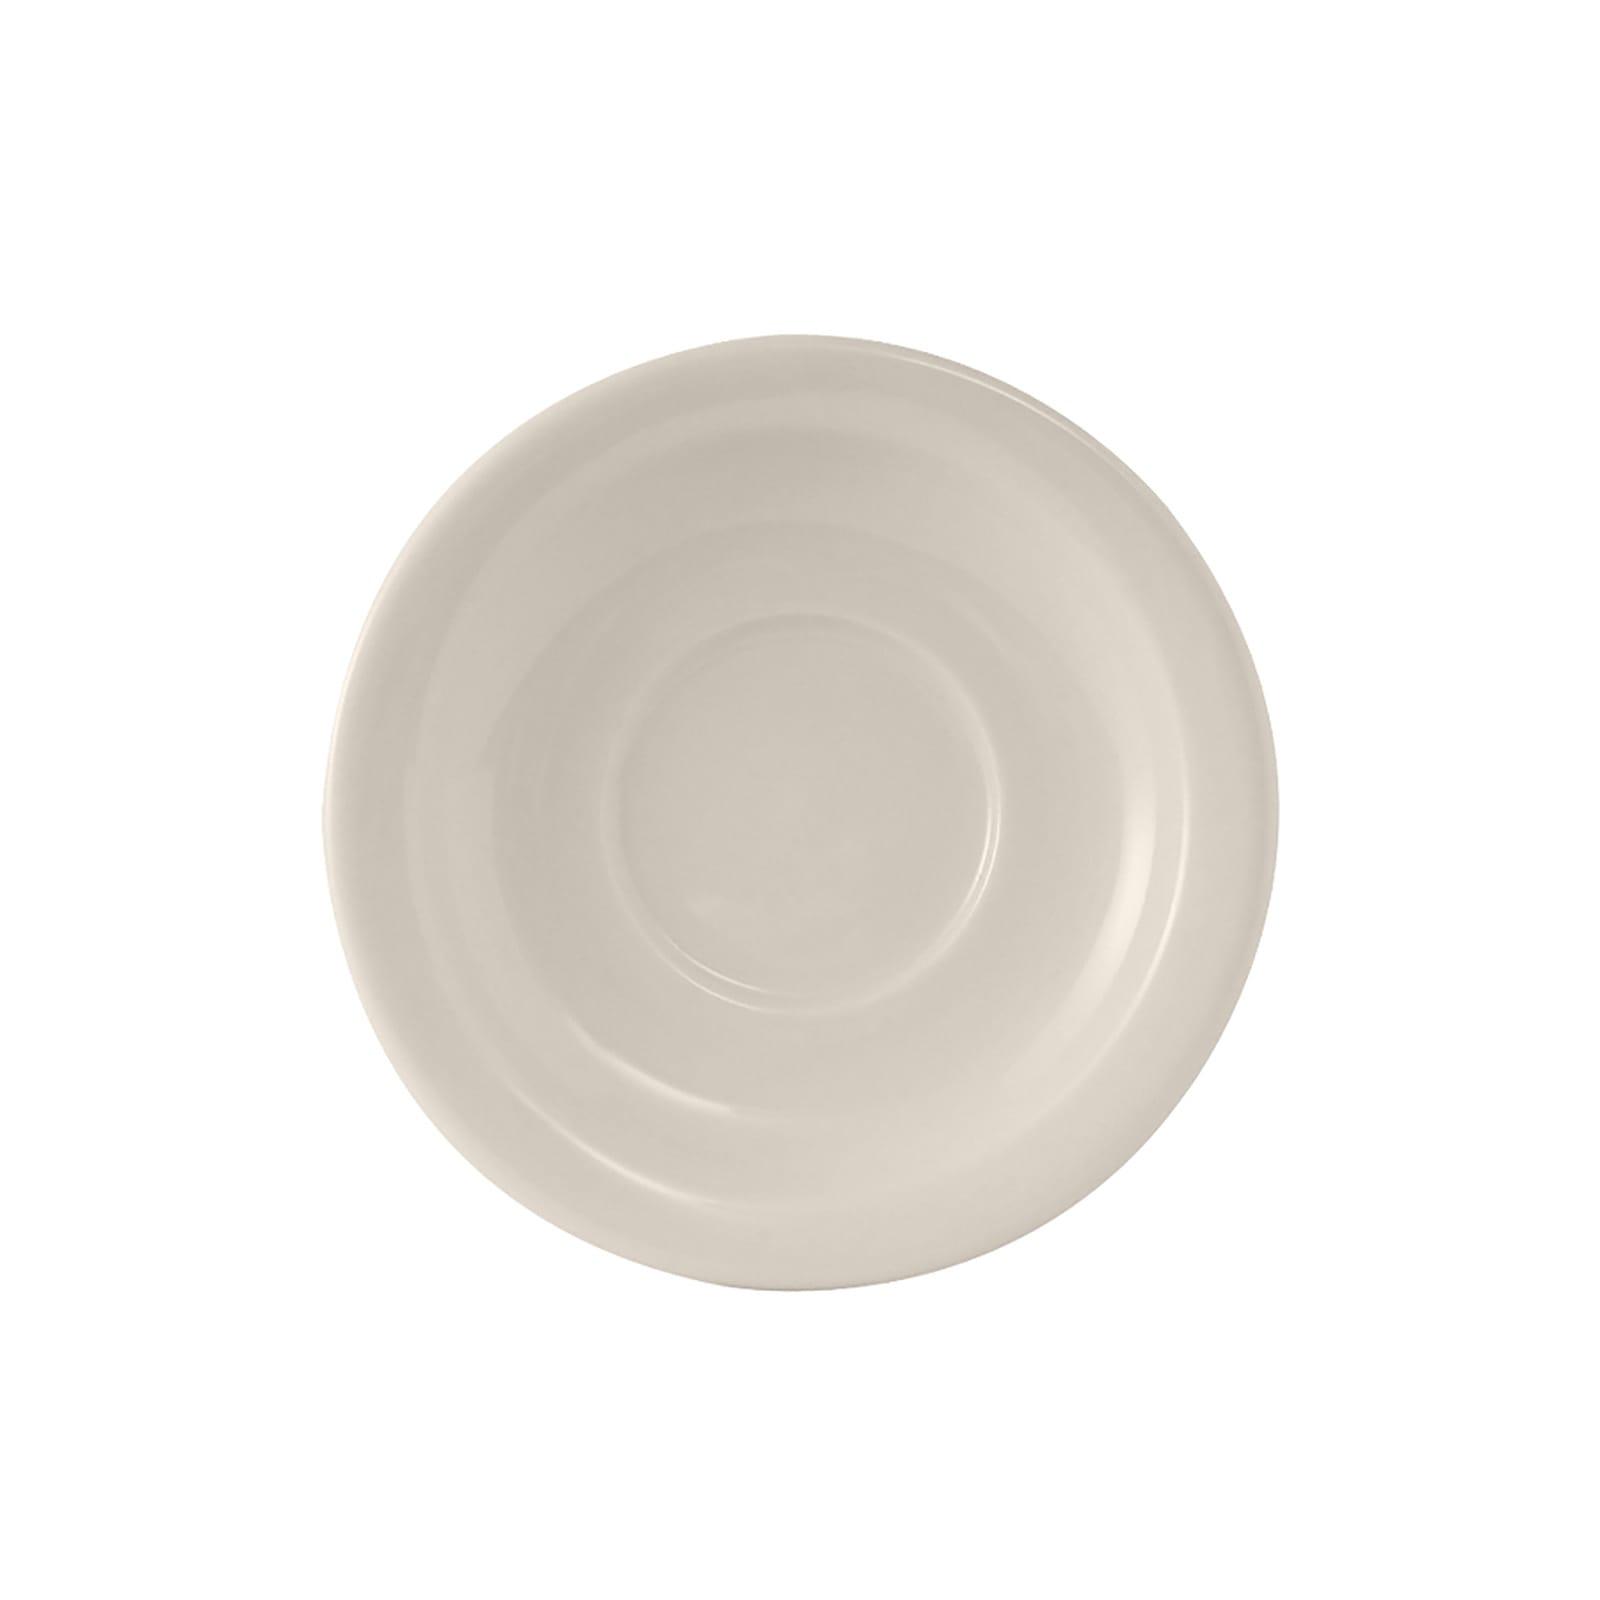 "Tuxton TNR-002 5.5"" Round Nevada Saucer - Ceramic, American White"